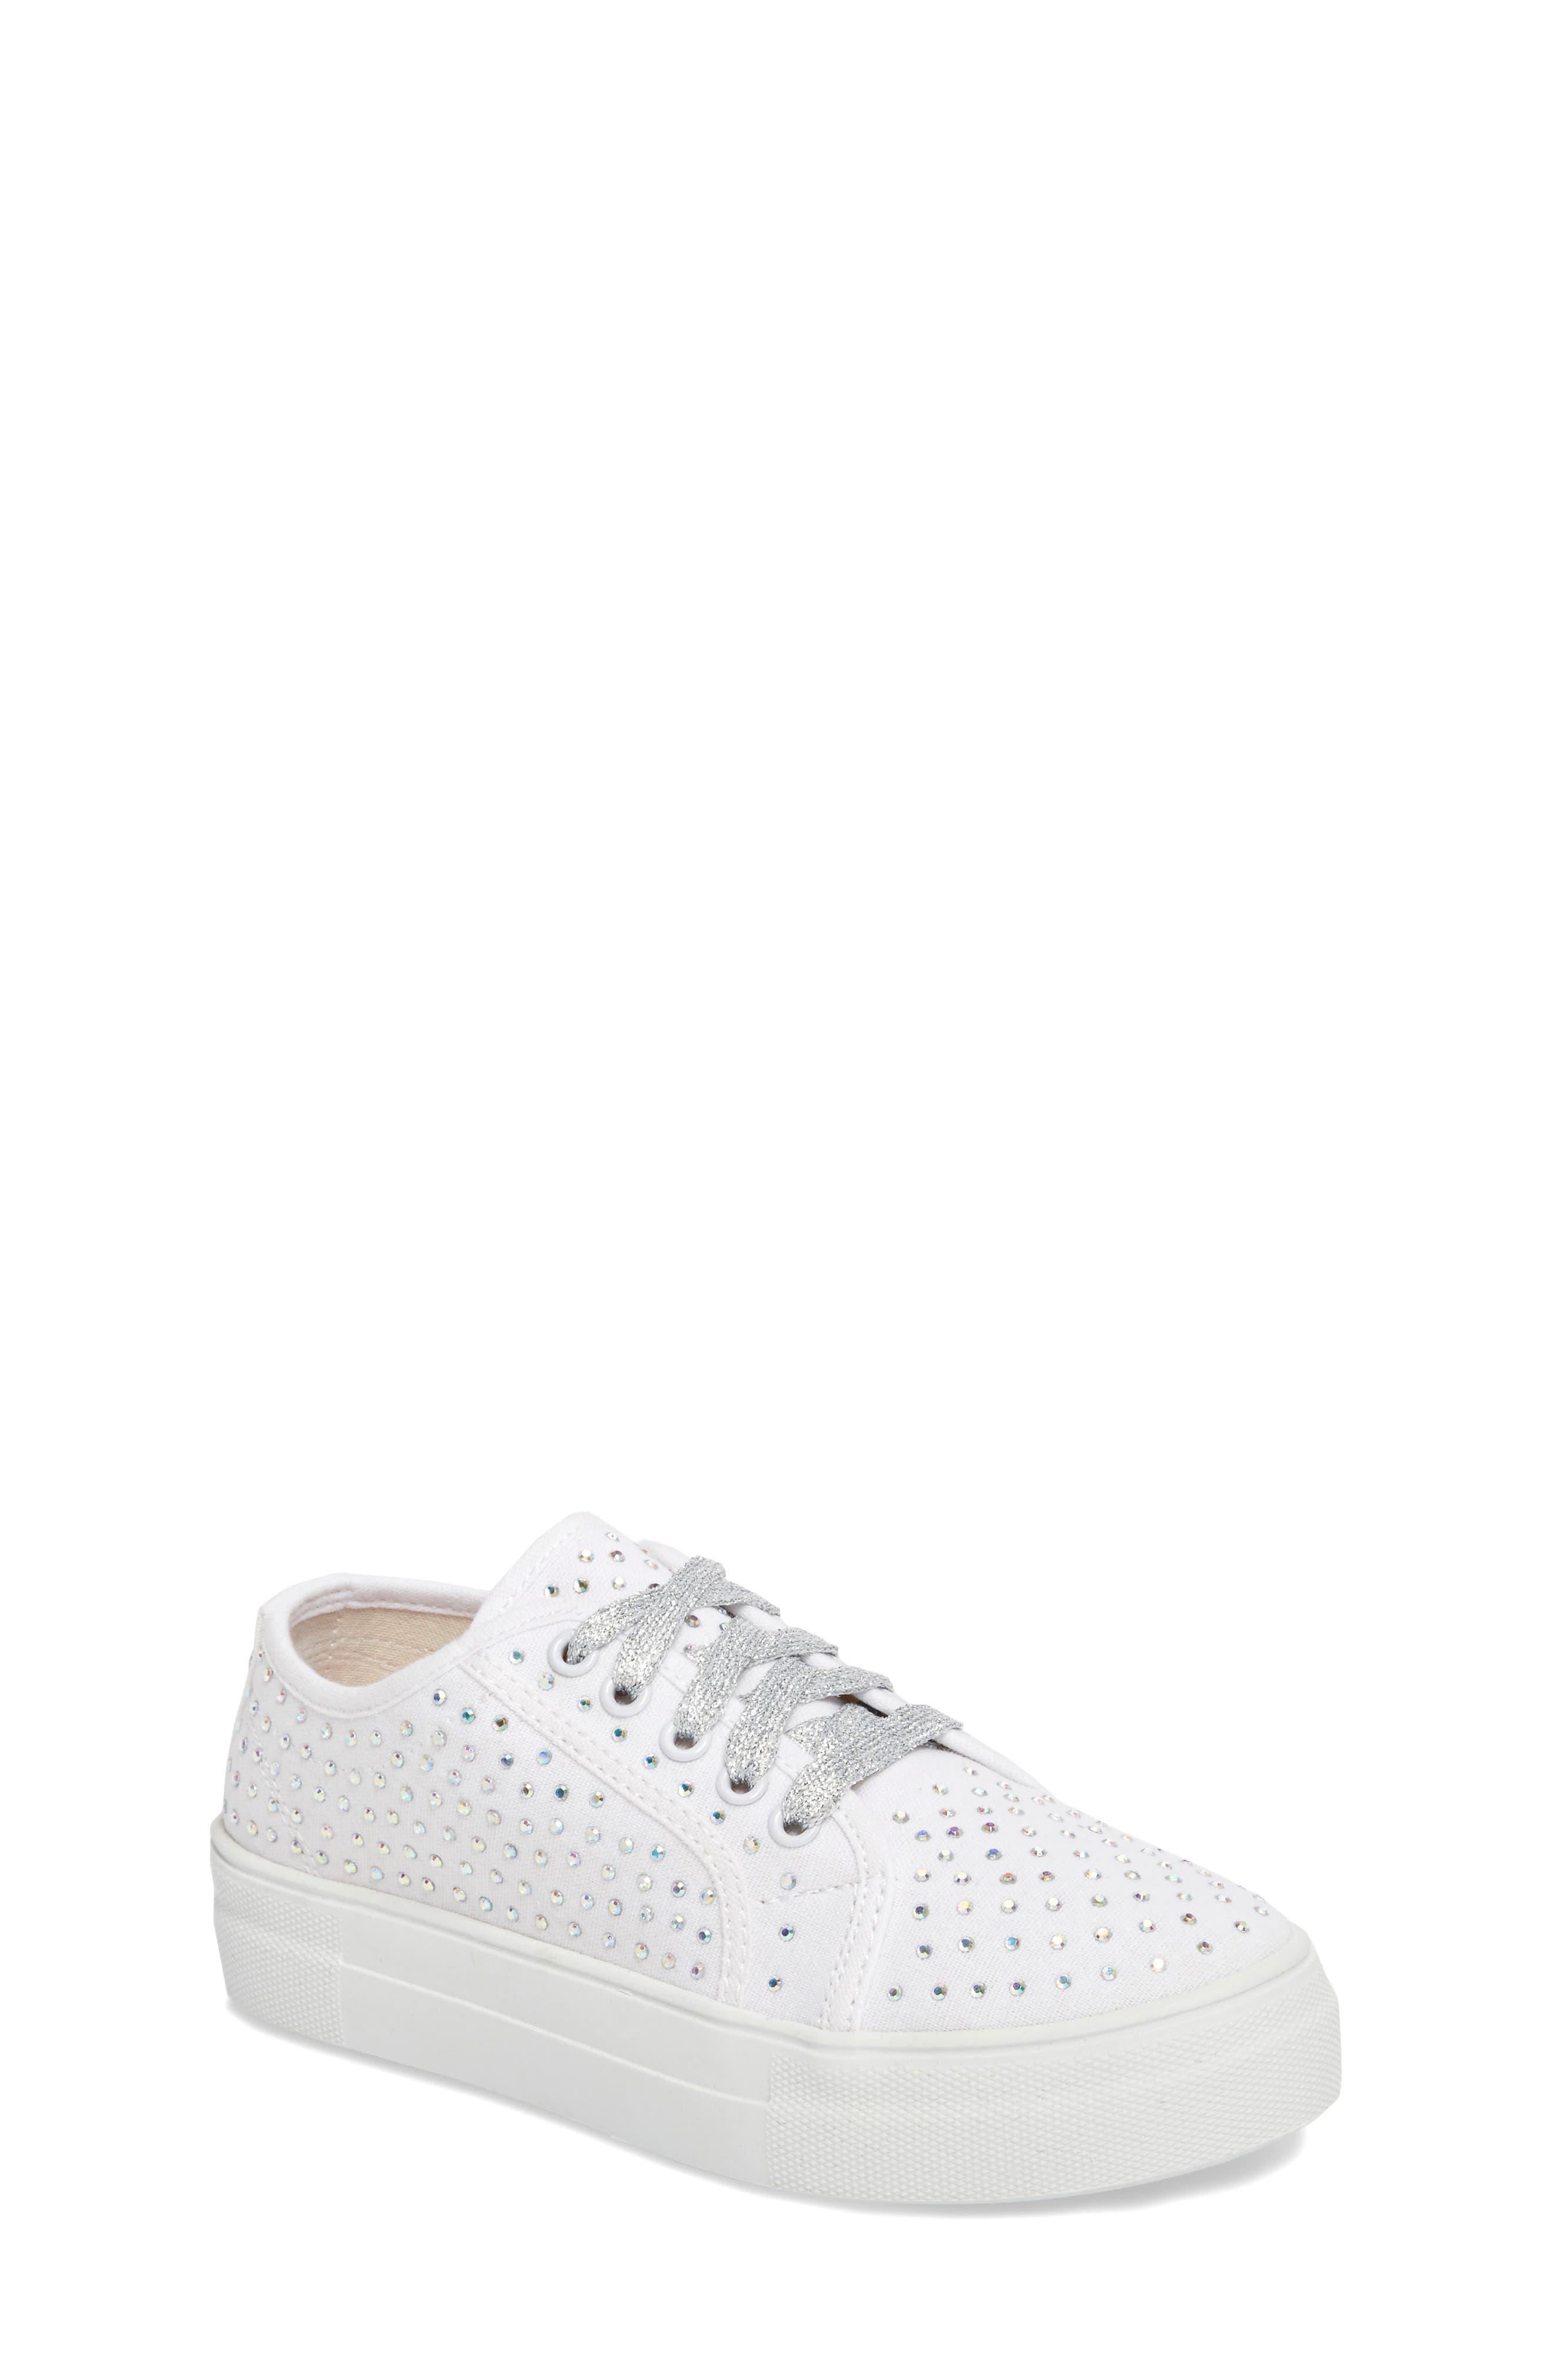 Jmono Sneaker,                         Main,                         color, 100